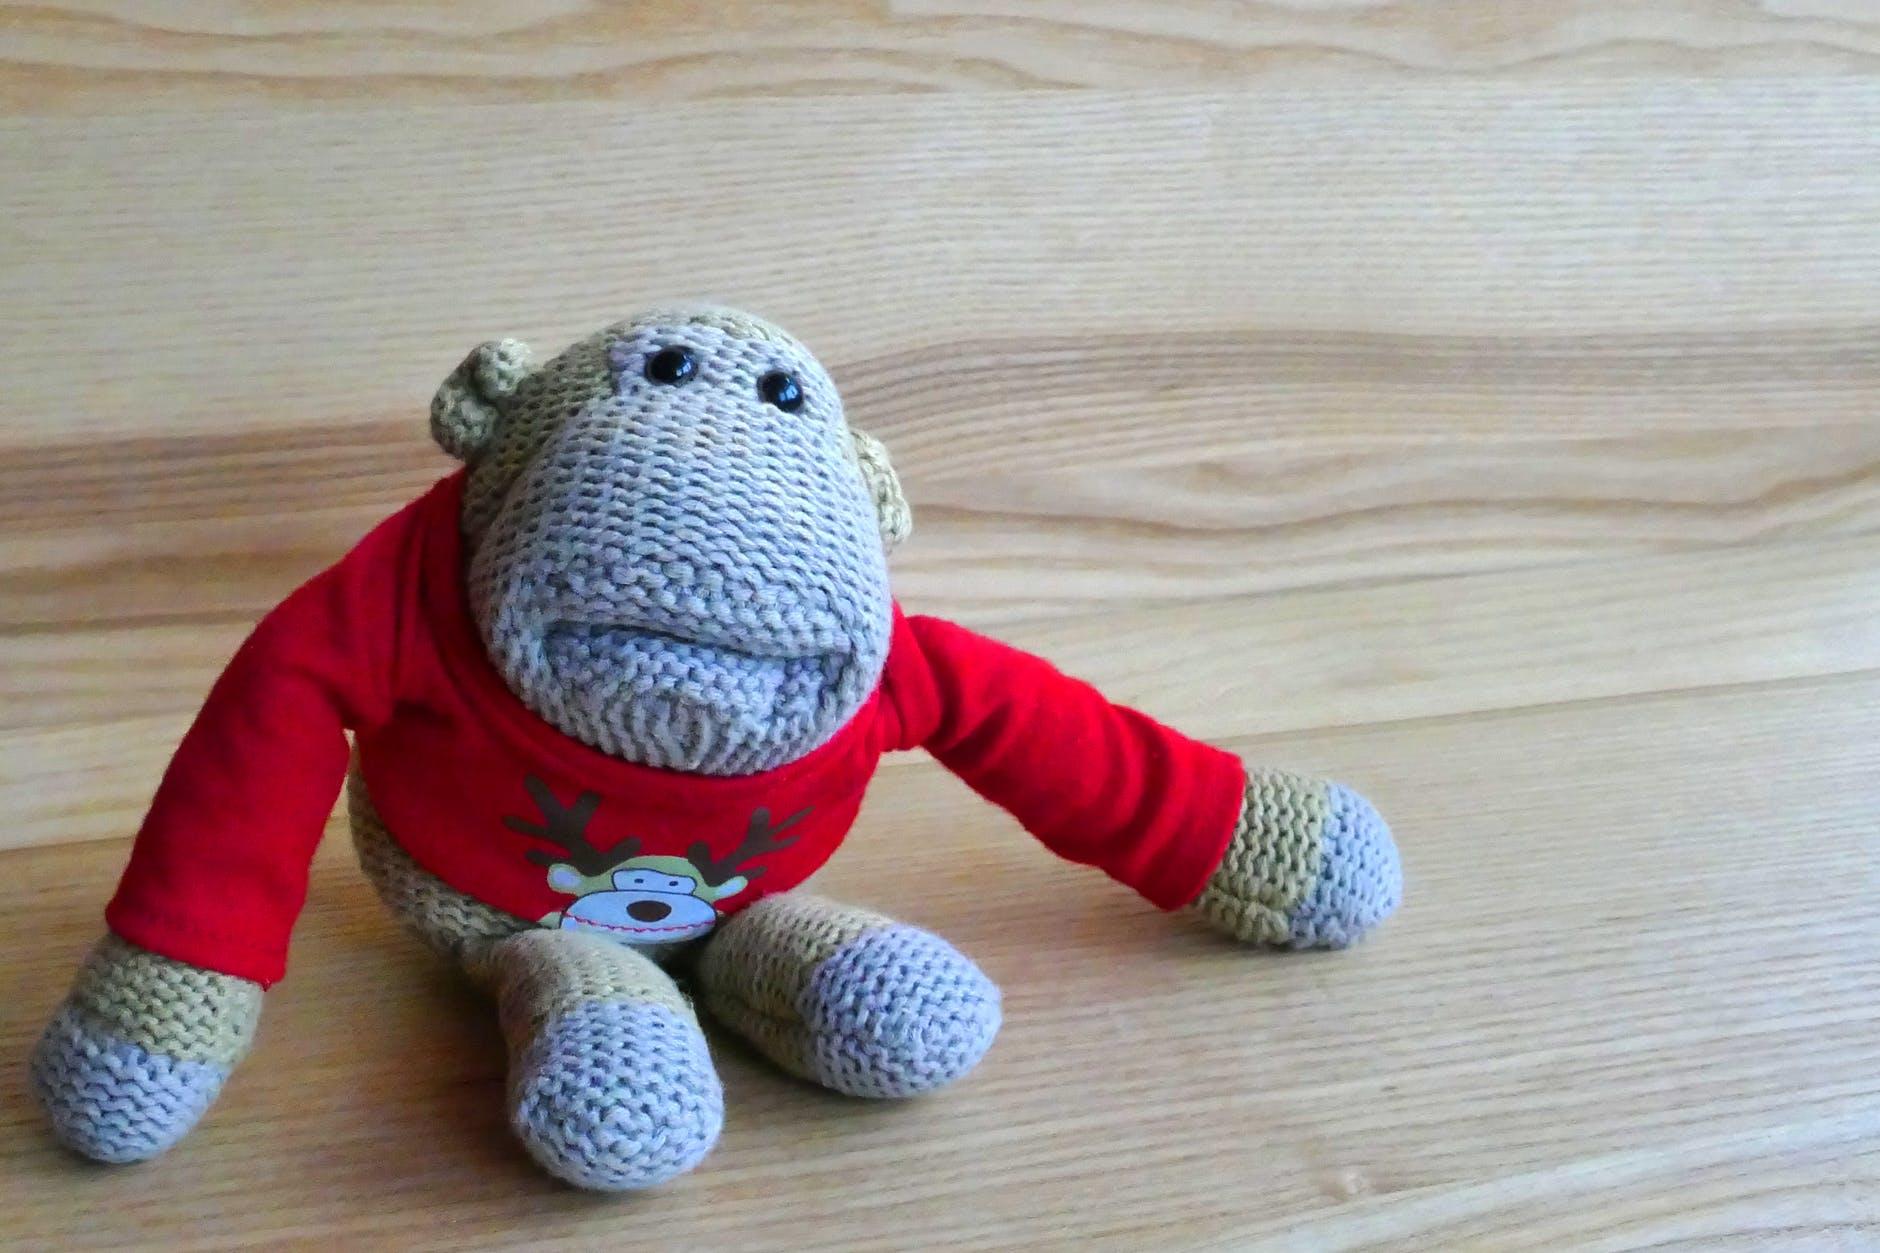 cute monkey play stuffed toy